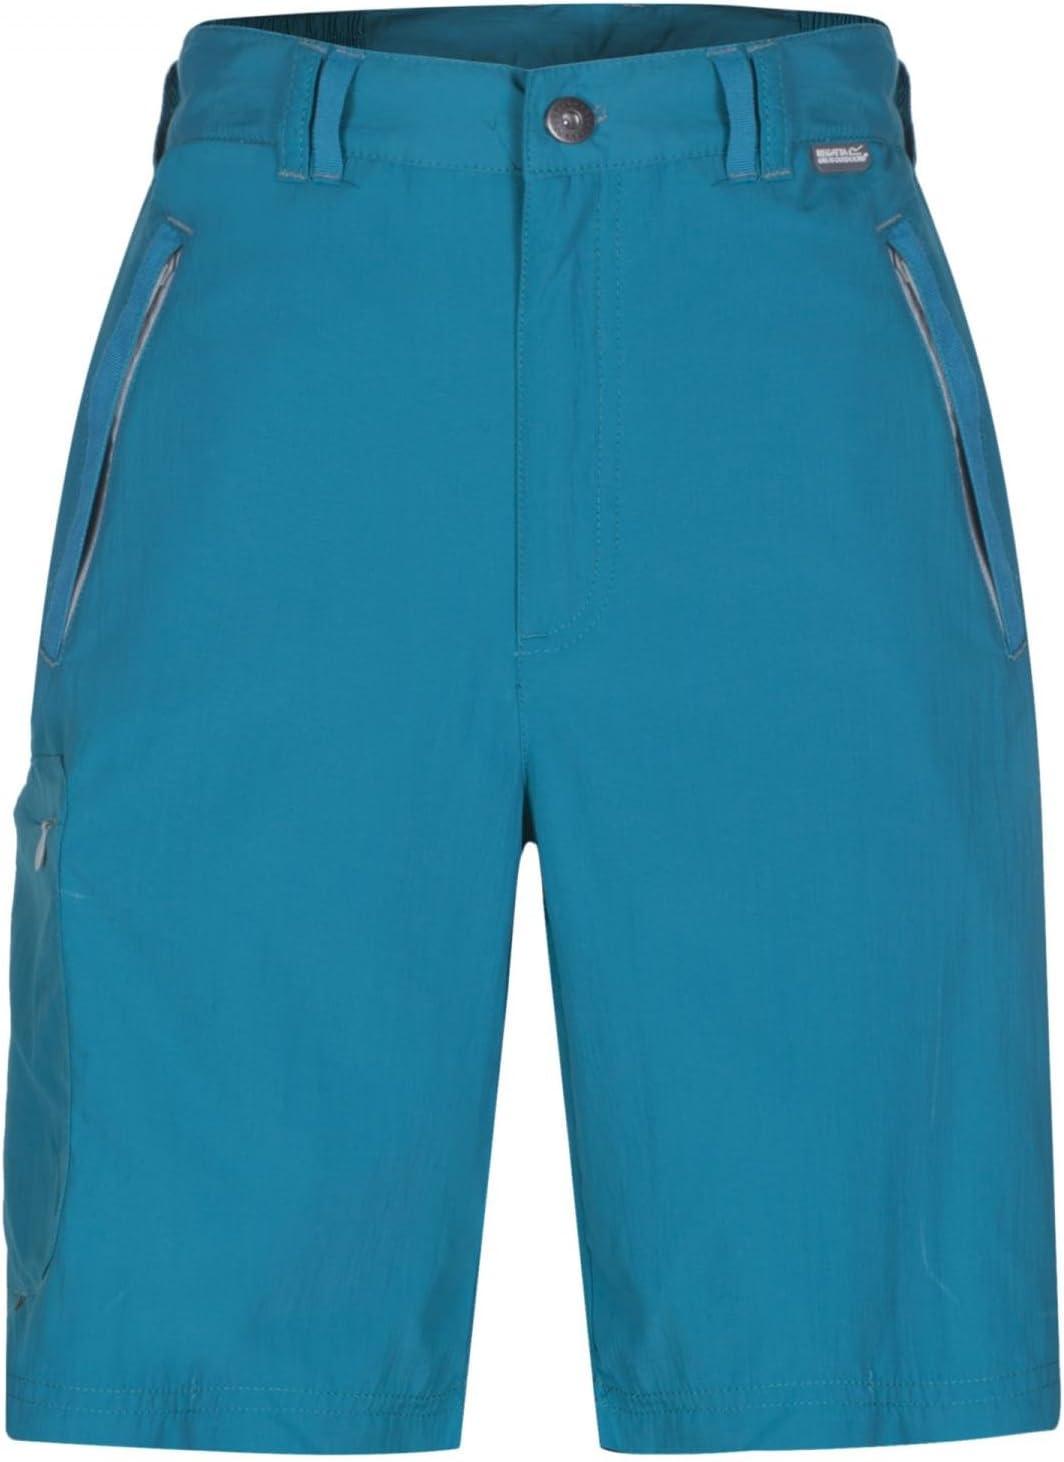 Regatta Womens Chaska Lightweight Water Repellent Uv Protection Active Hiking Shorts